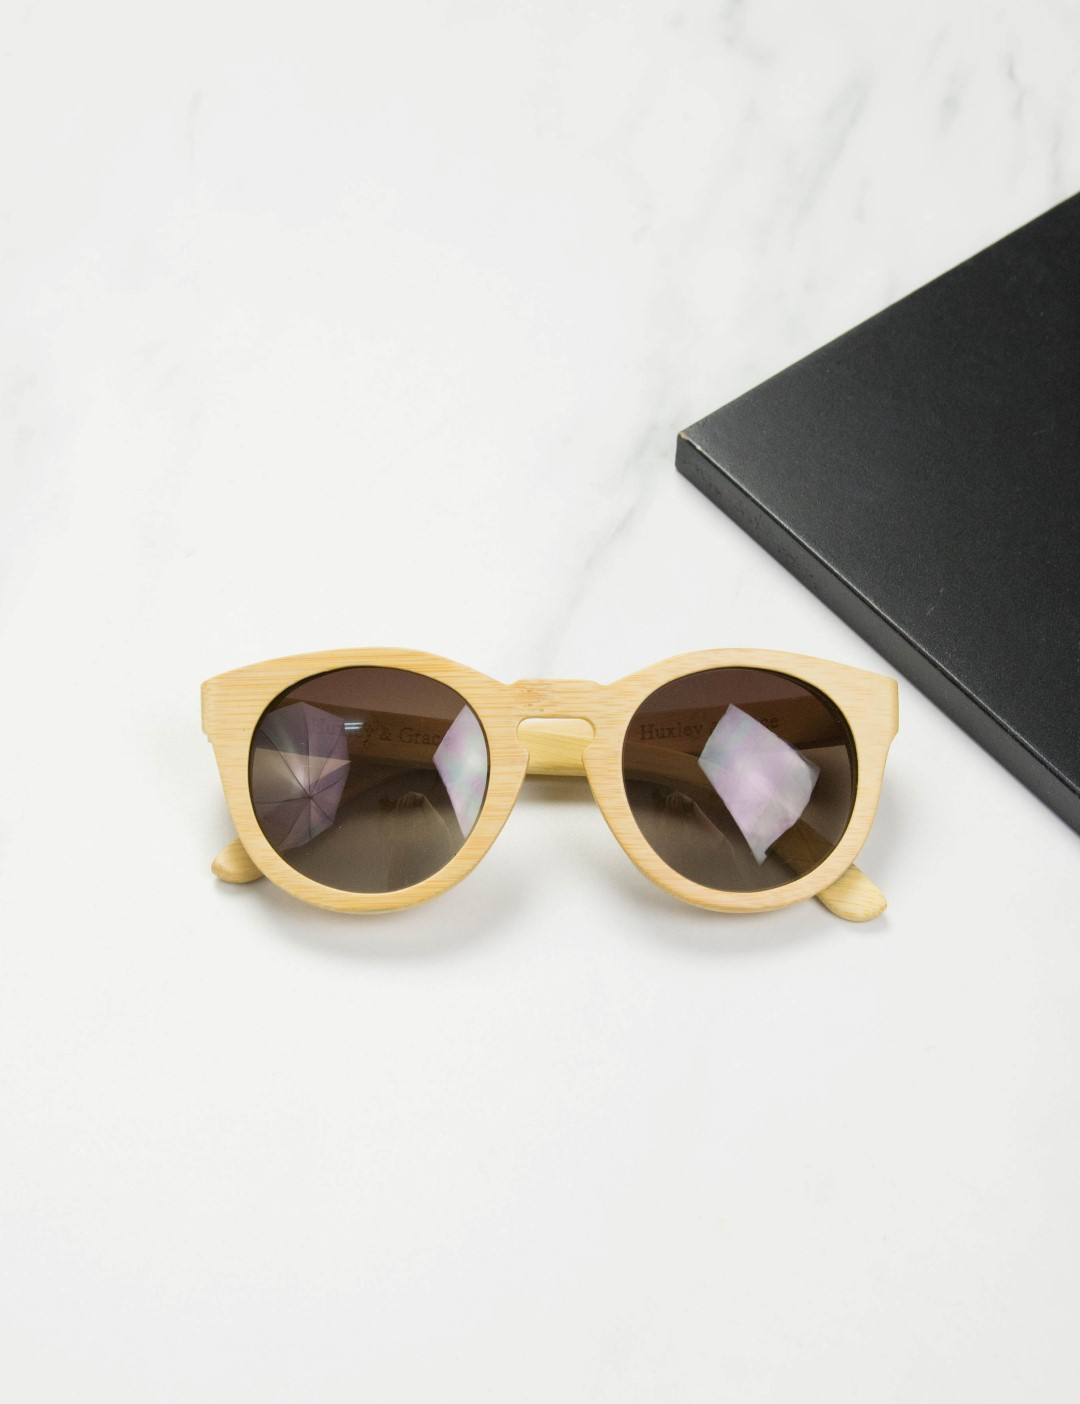 eecf193799 Huxley   Grace ξύλινα γυαλιά ηλίου Mariano 9629 (Bamboo)